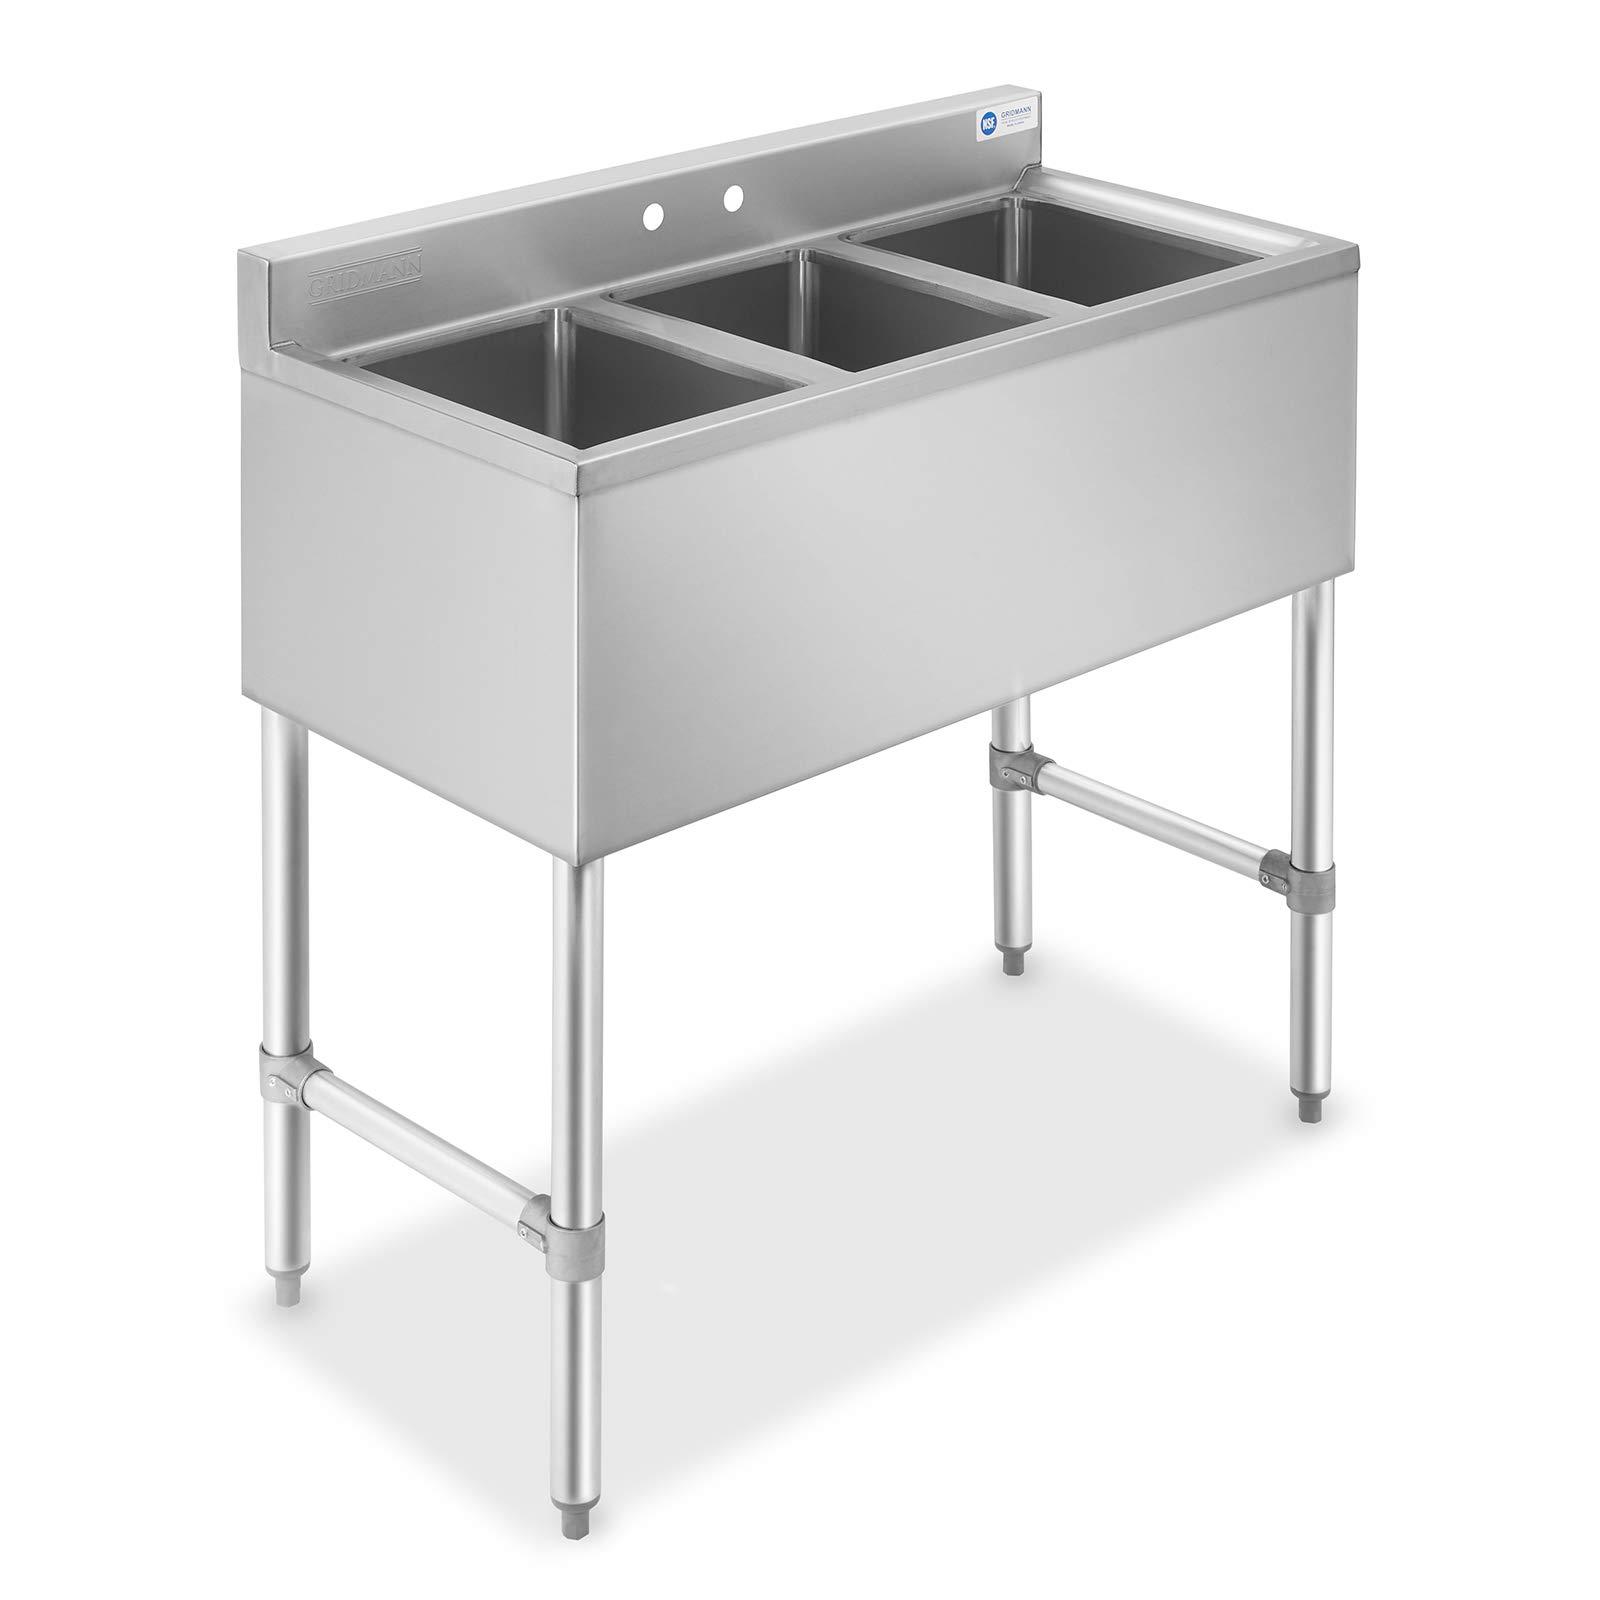 GRIDMANN 3 Compartment NSF Stainless Steel Commercial Bar Sink by GRIDMANN